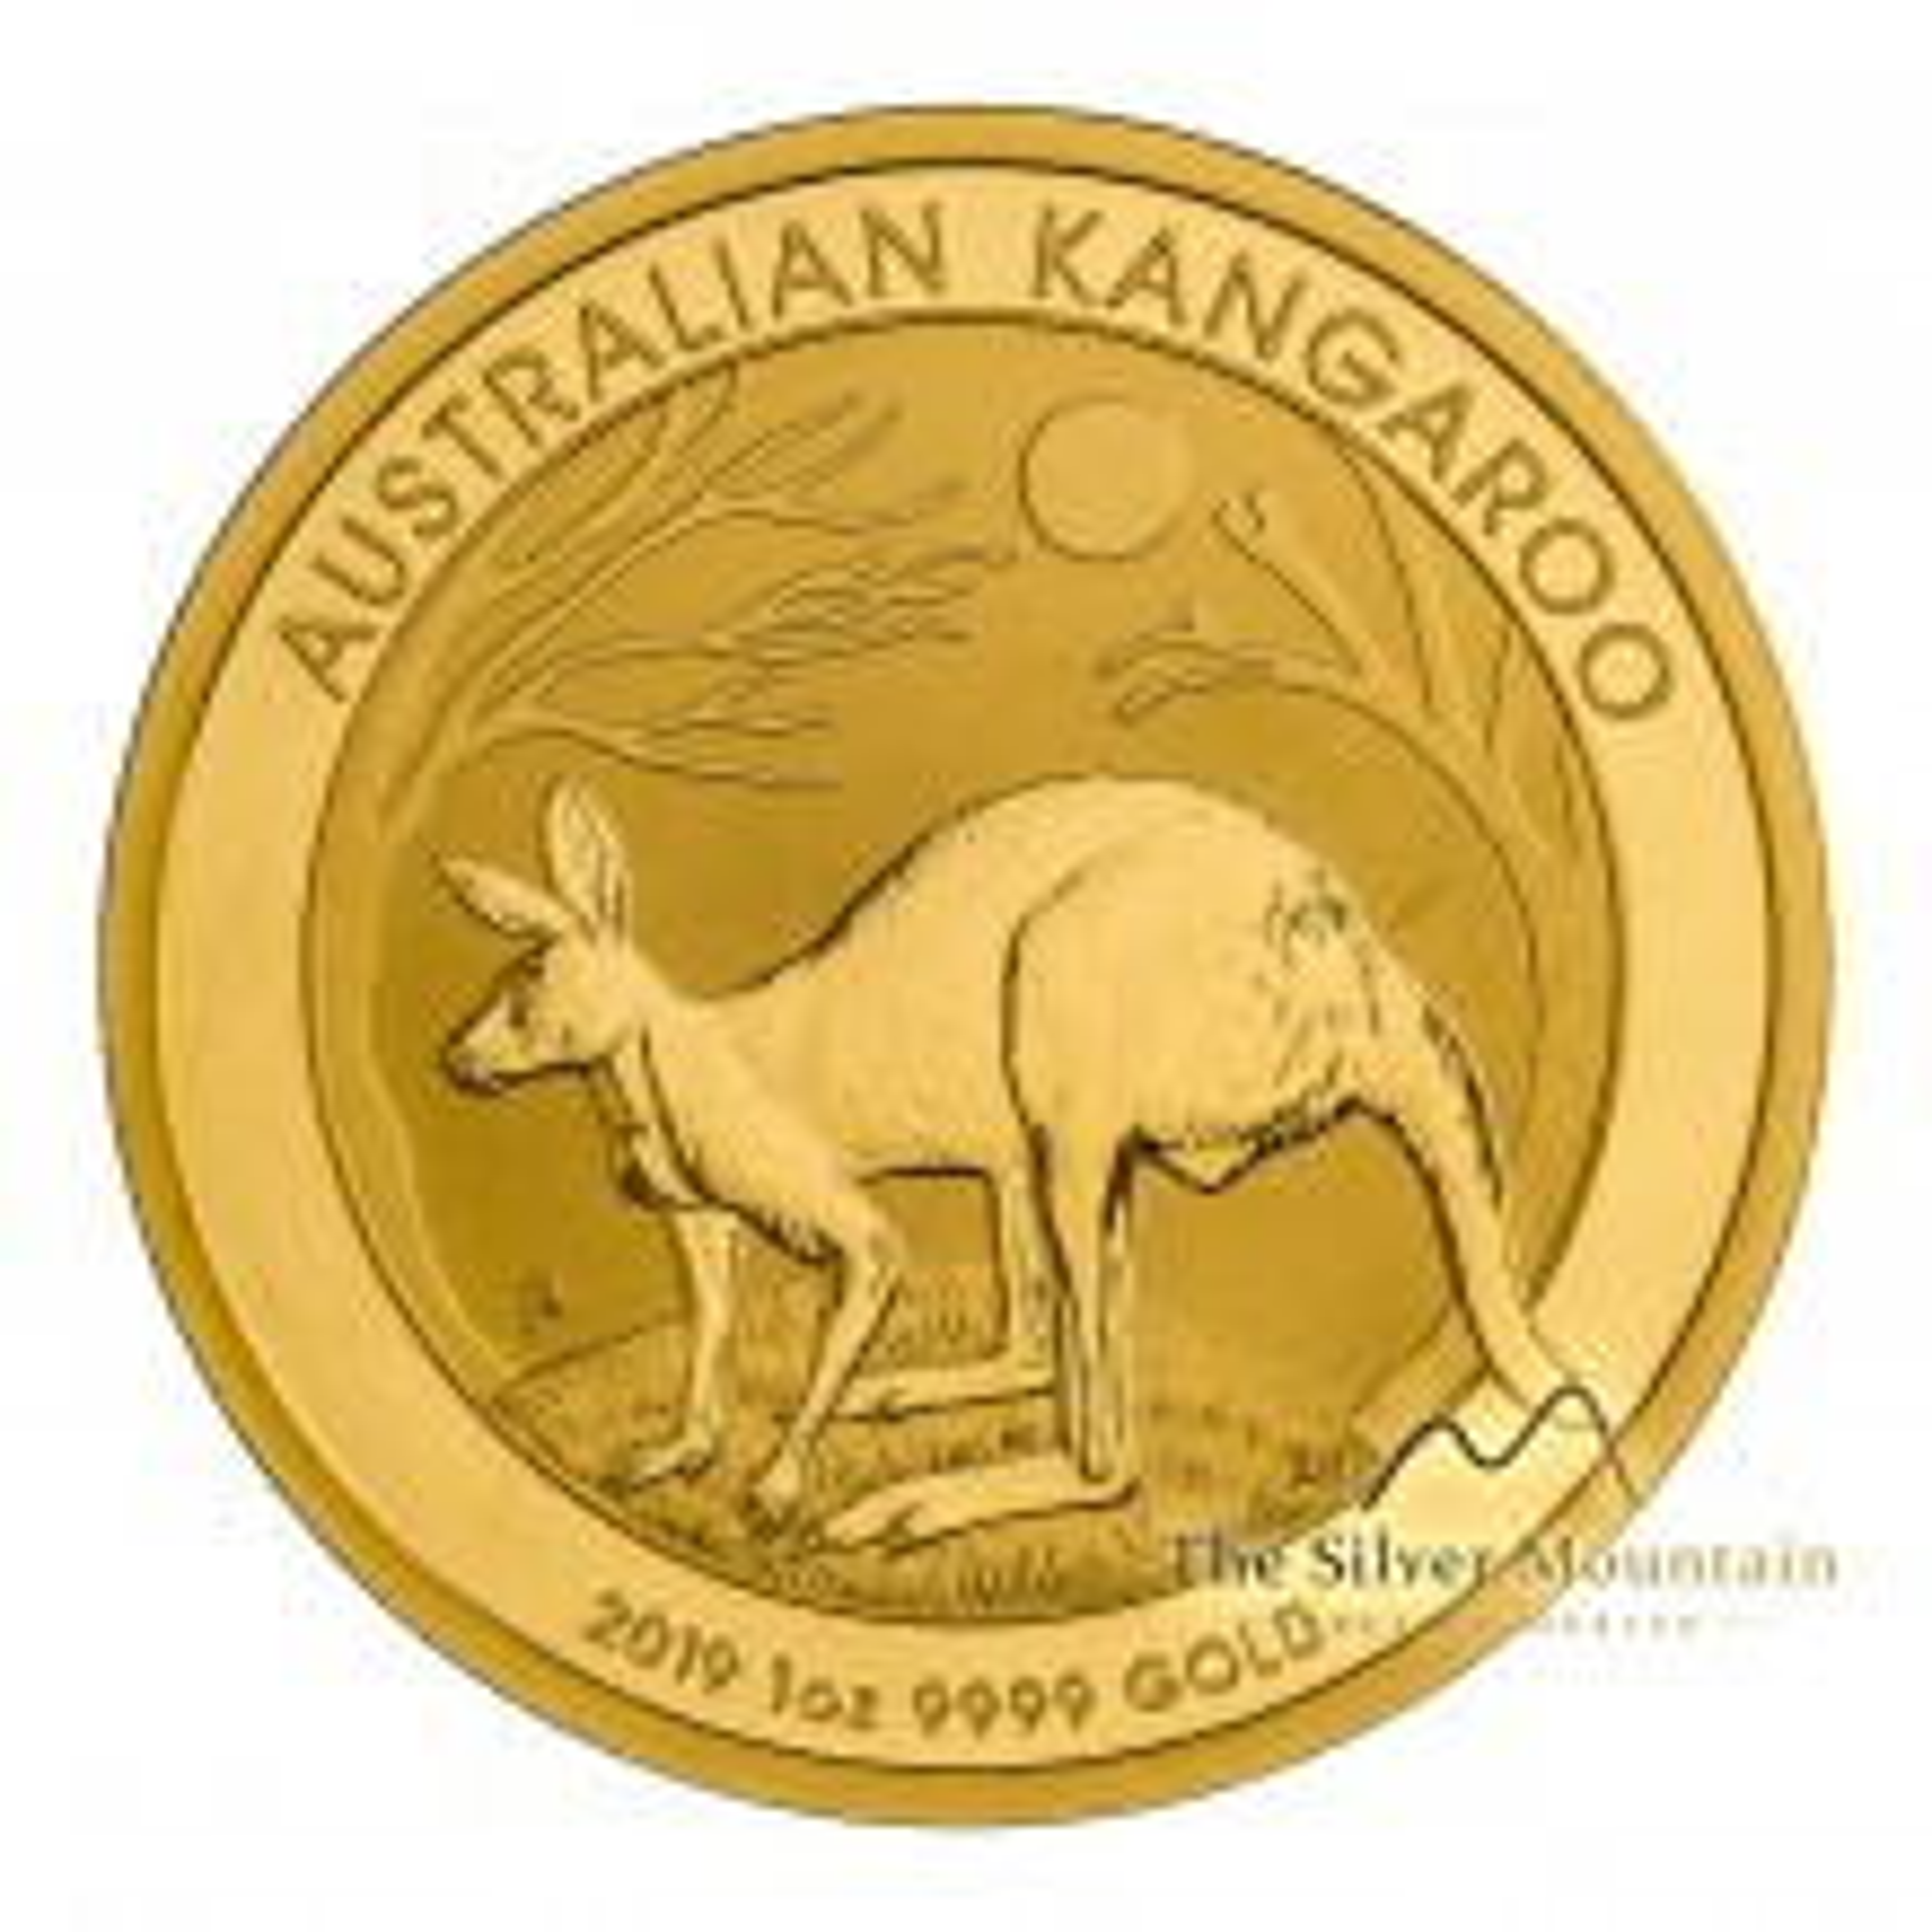 1 troy ounce gold Kangaroo 2019